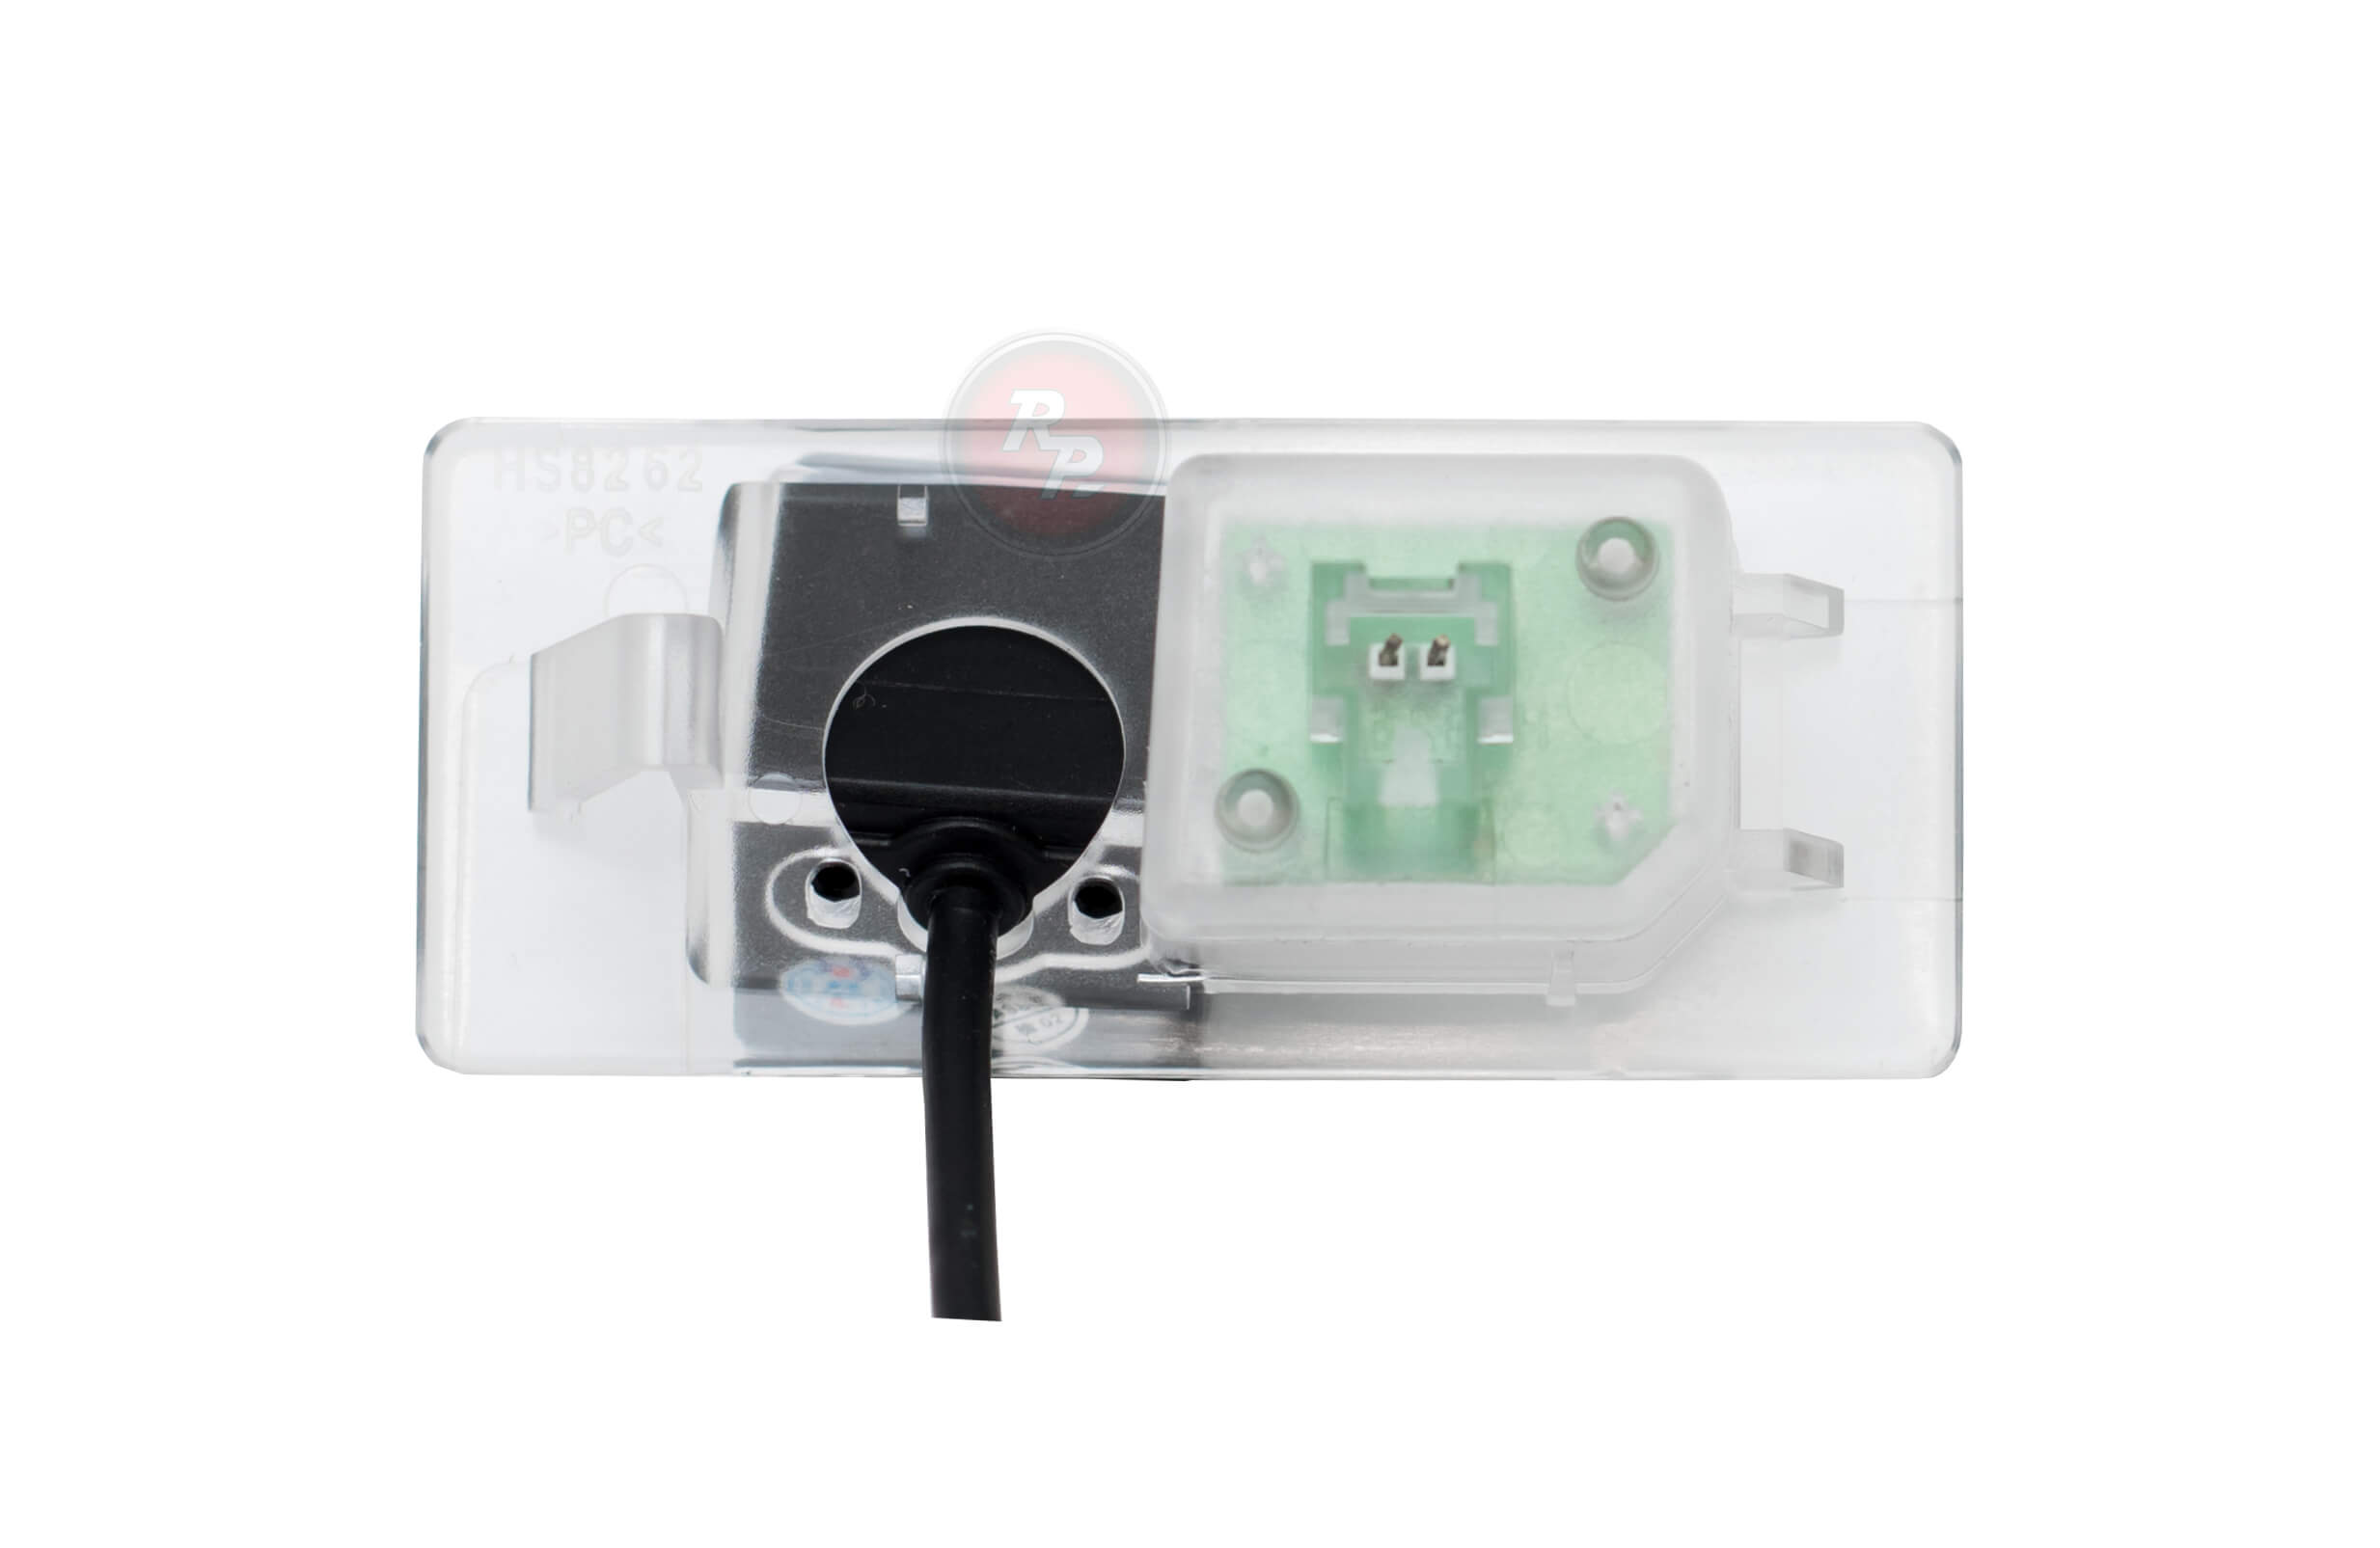 Камера парковки AUDI377P Premium HD 720P вид сзади